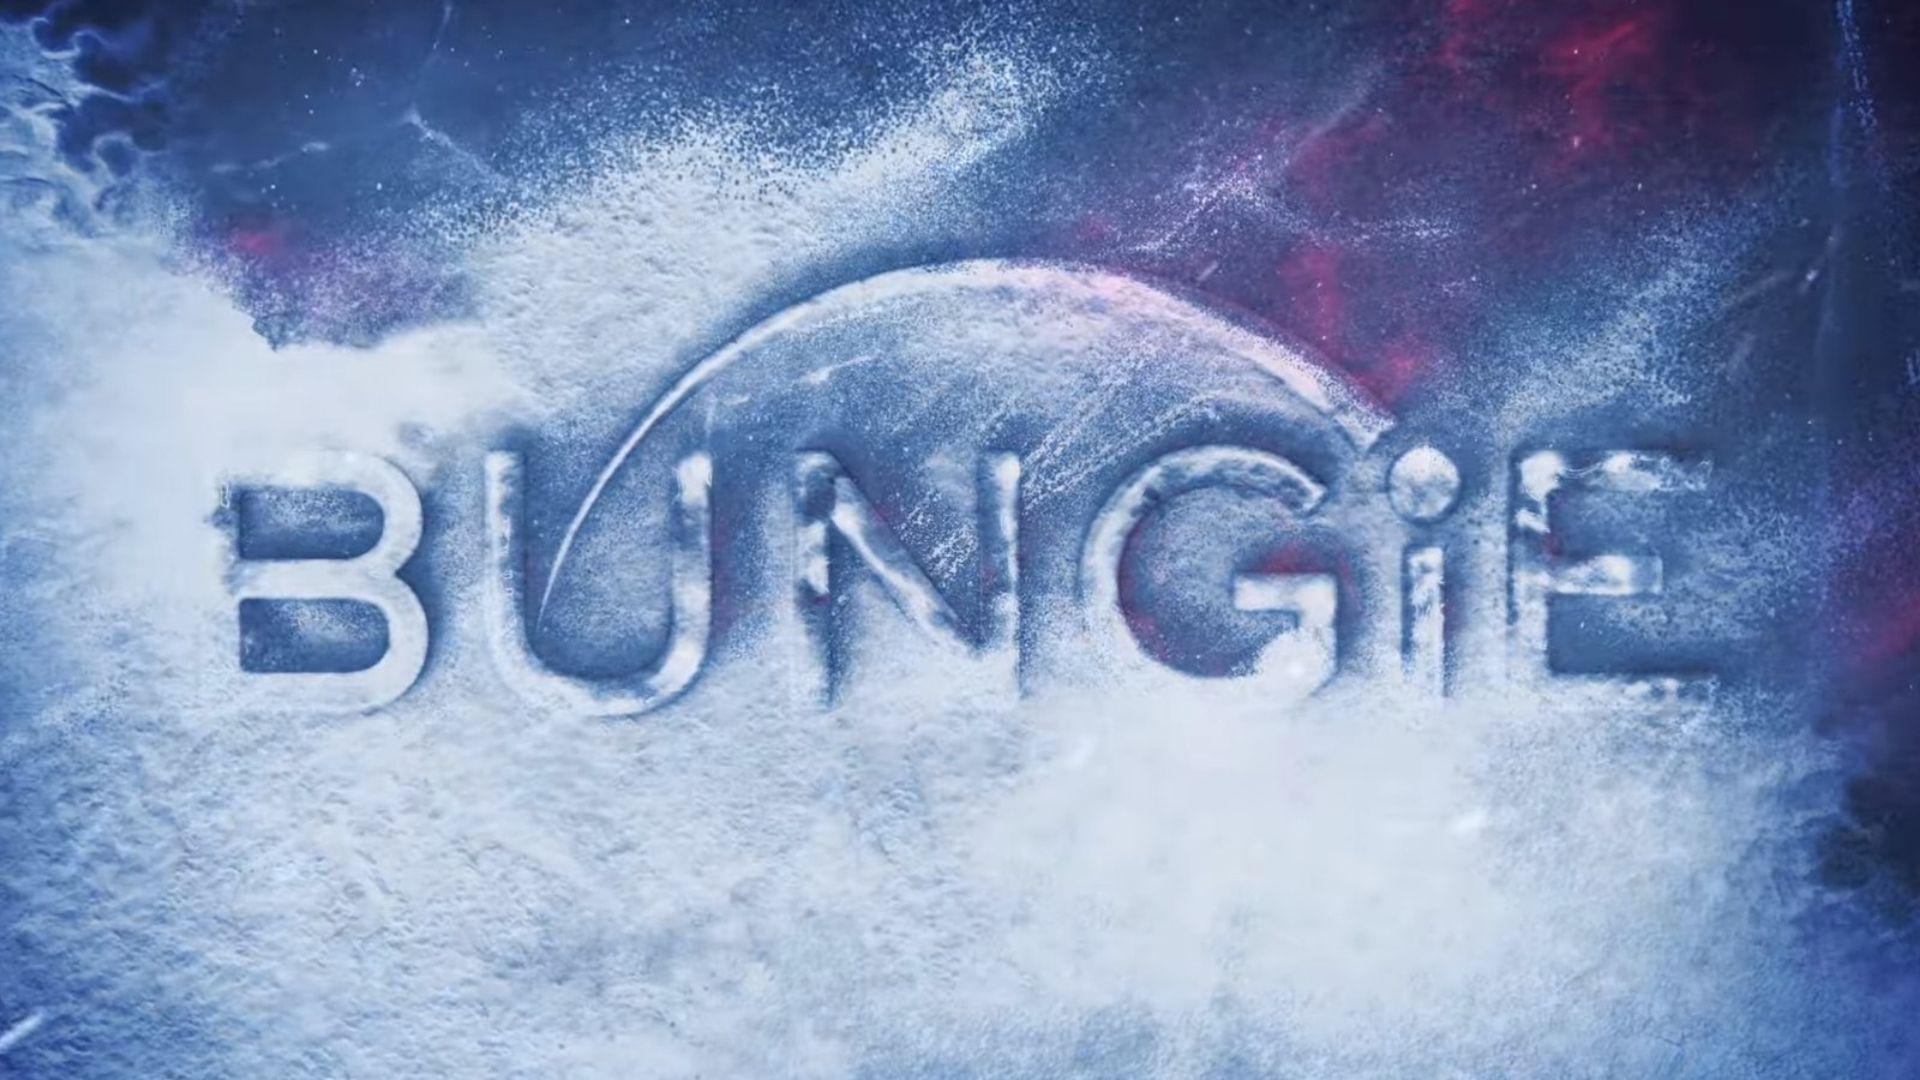 The Bungie logo in Destiny 2